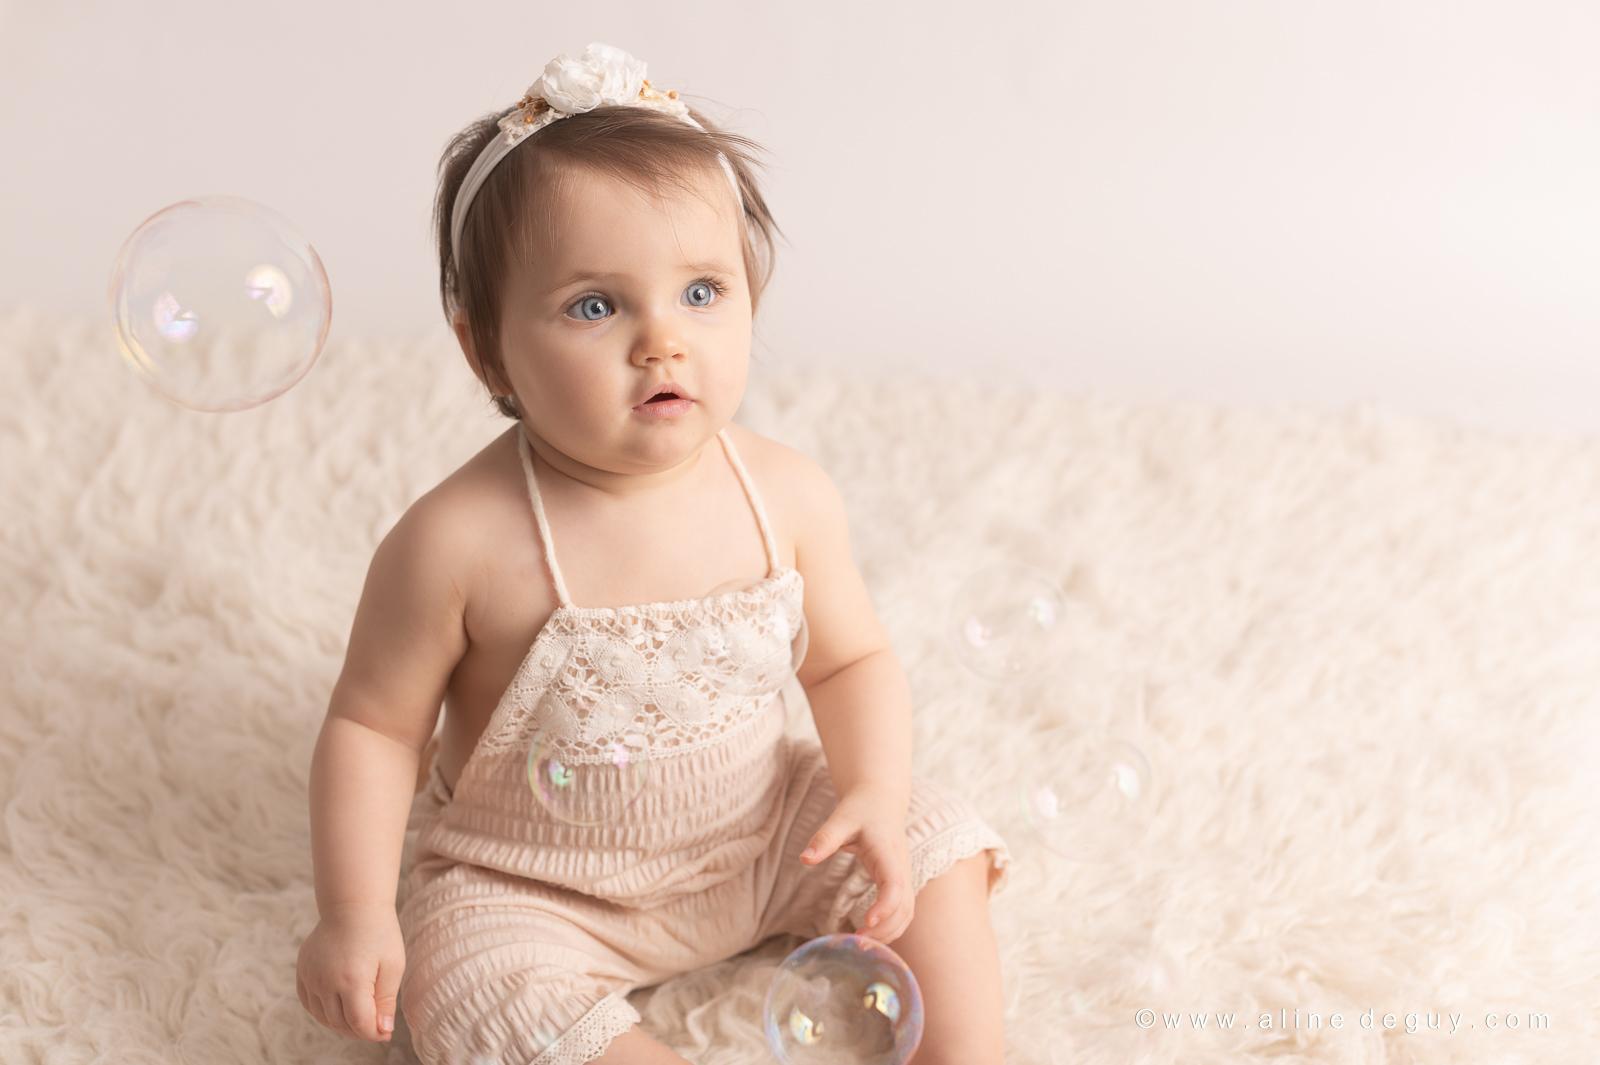 Photographe bébé suresnes, photo de bébé yeux bleus, prénom jade